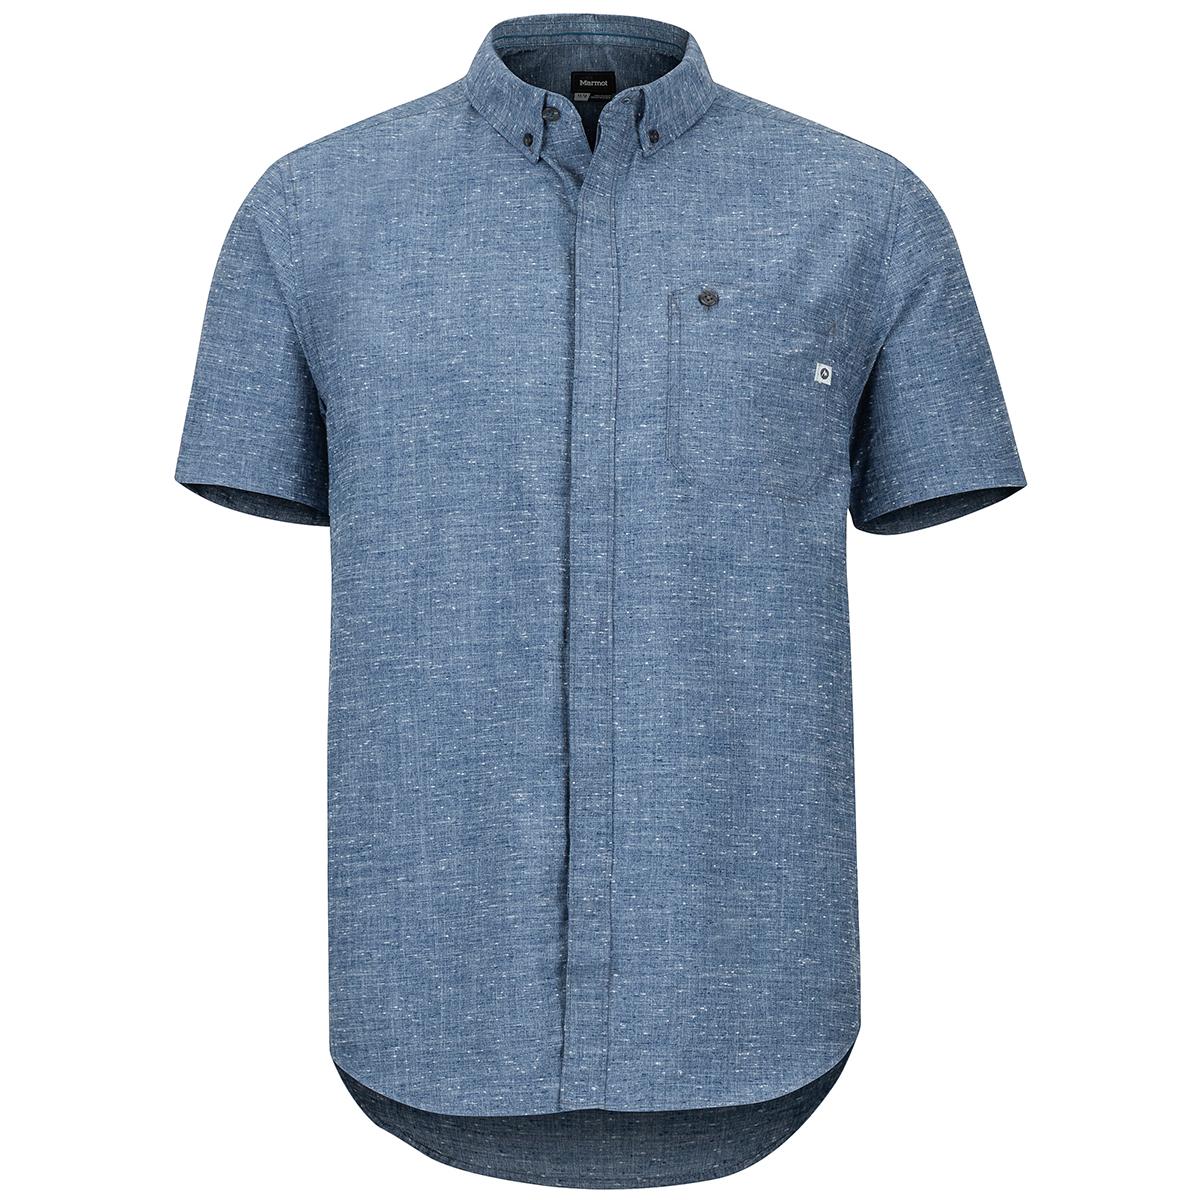 Marmot Men's Cooper Canyon Short-Sleeve Shirt - Blue, L